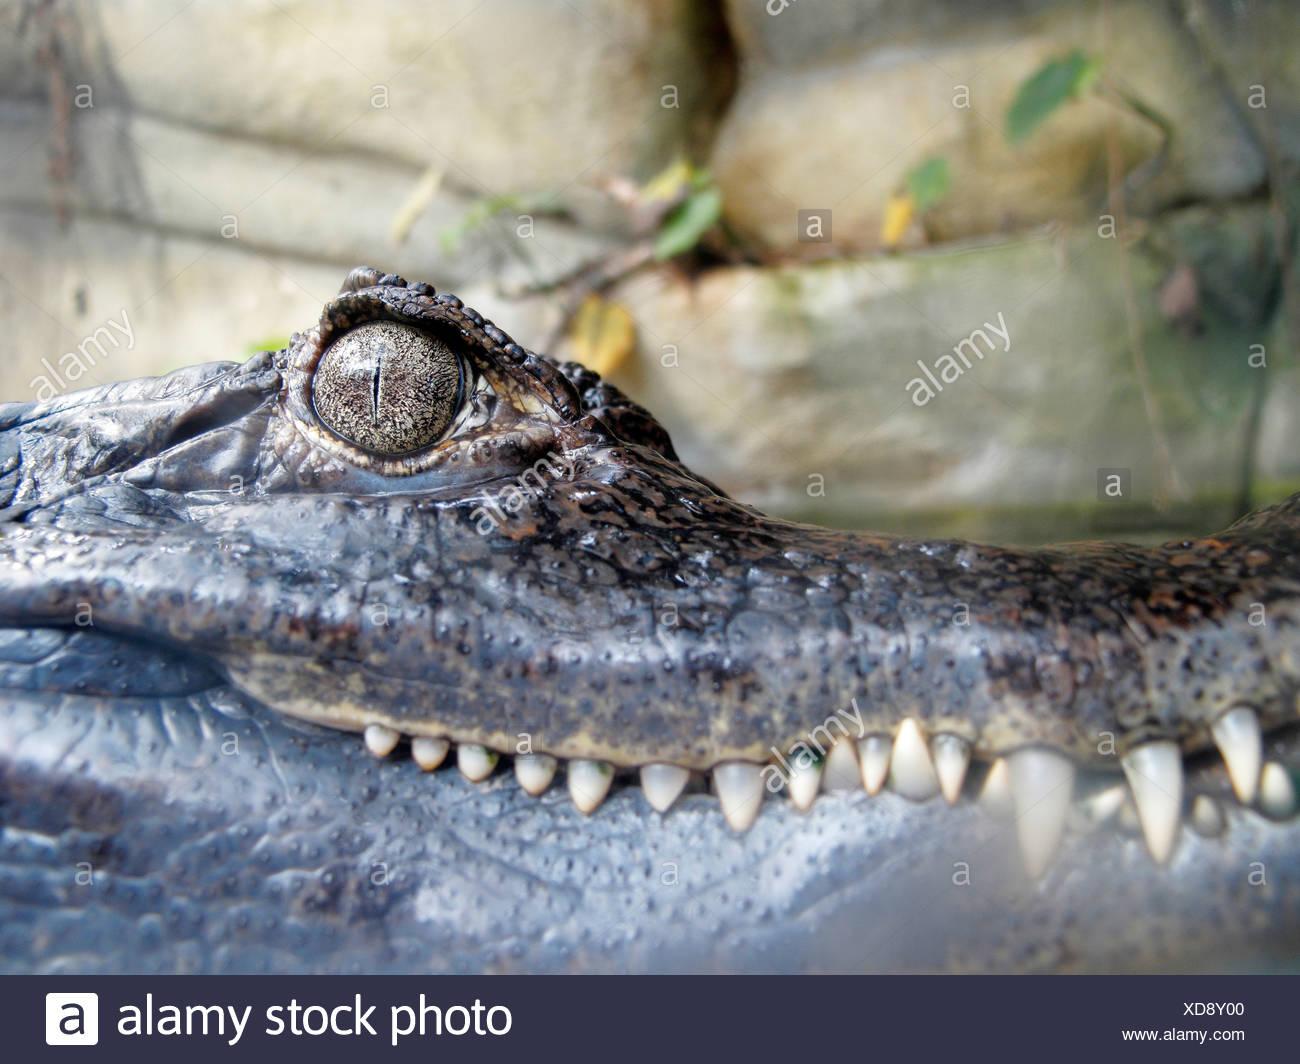 Spectacled Caiman (Caïman Crocodilus) - Stock Image